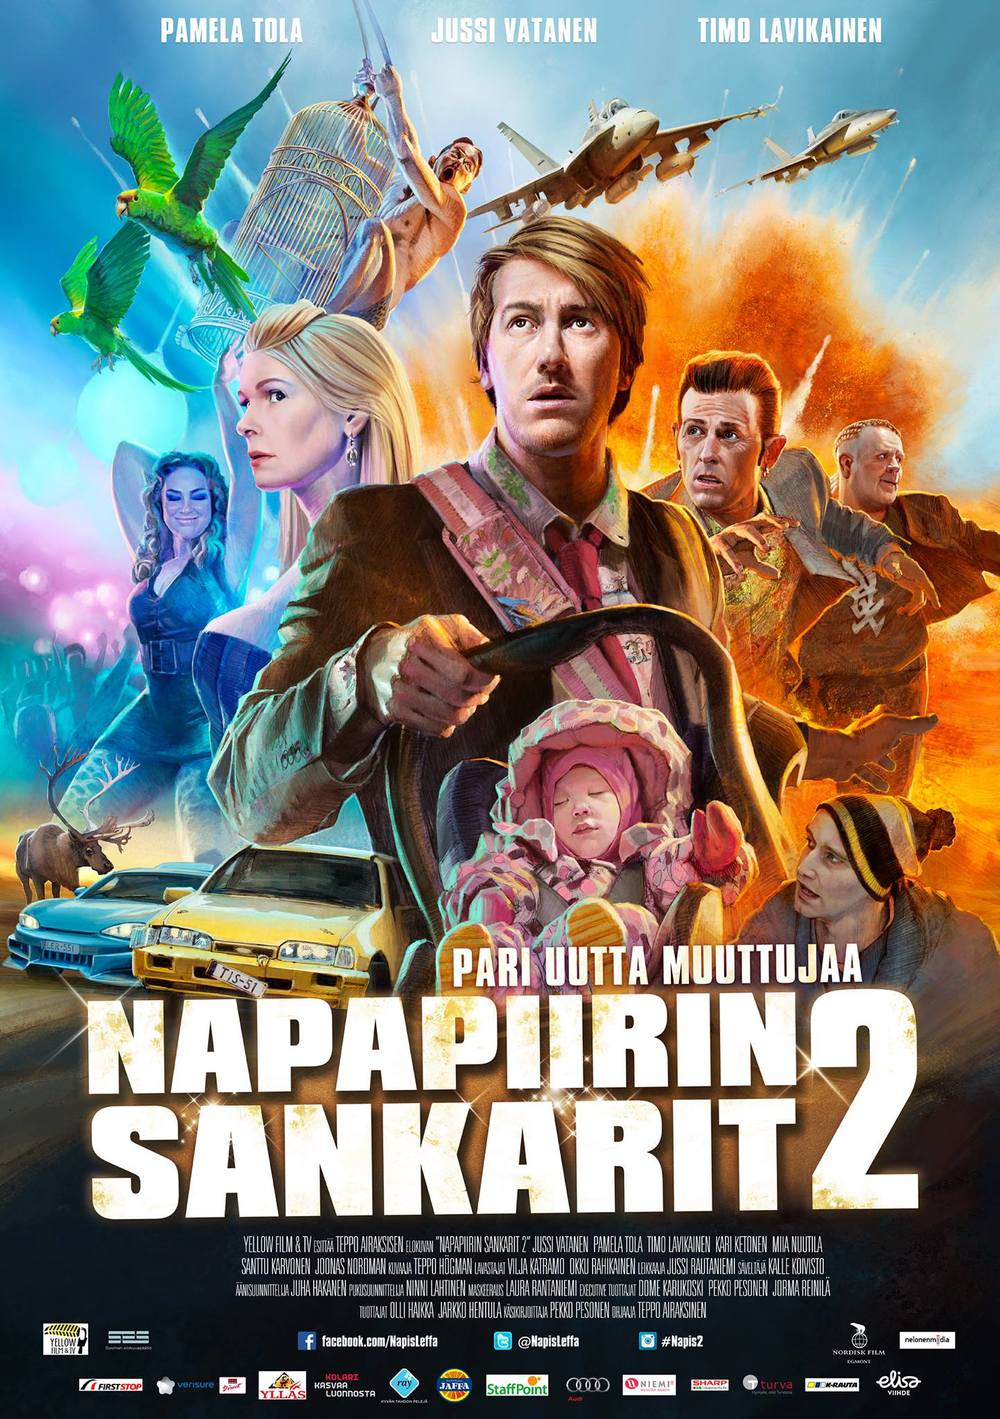 Napapiirin sankarit 2 –Lapland Odyssey  dir. Teppo Airaksinen Yellow Film & Tv / 2015